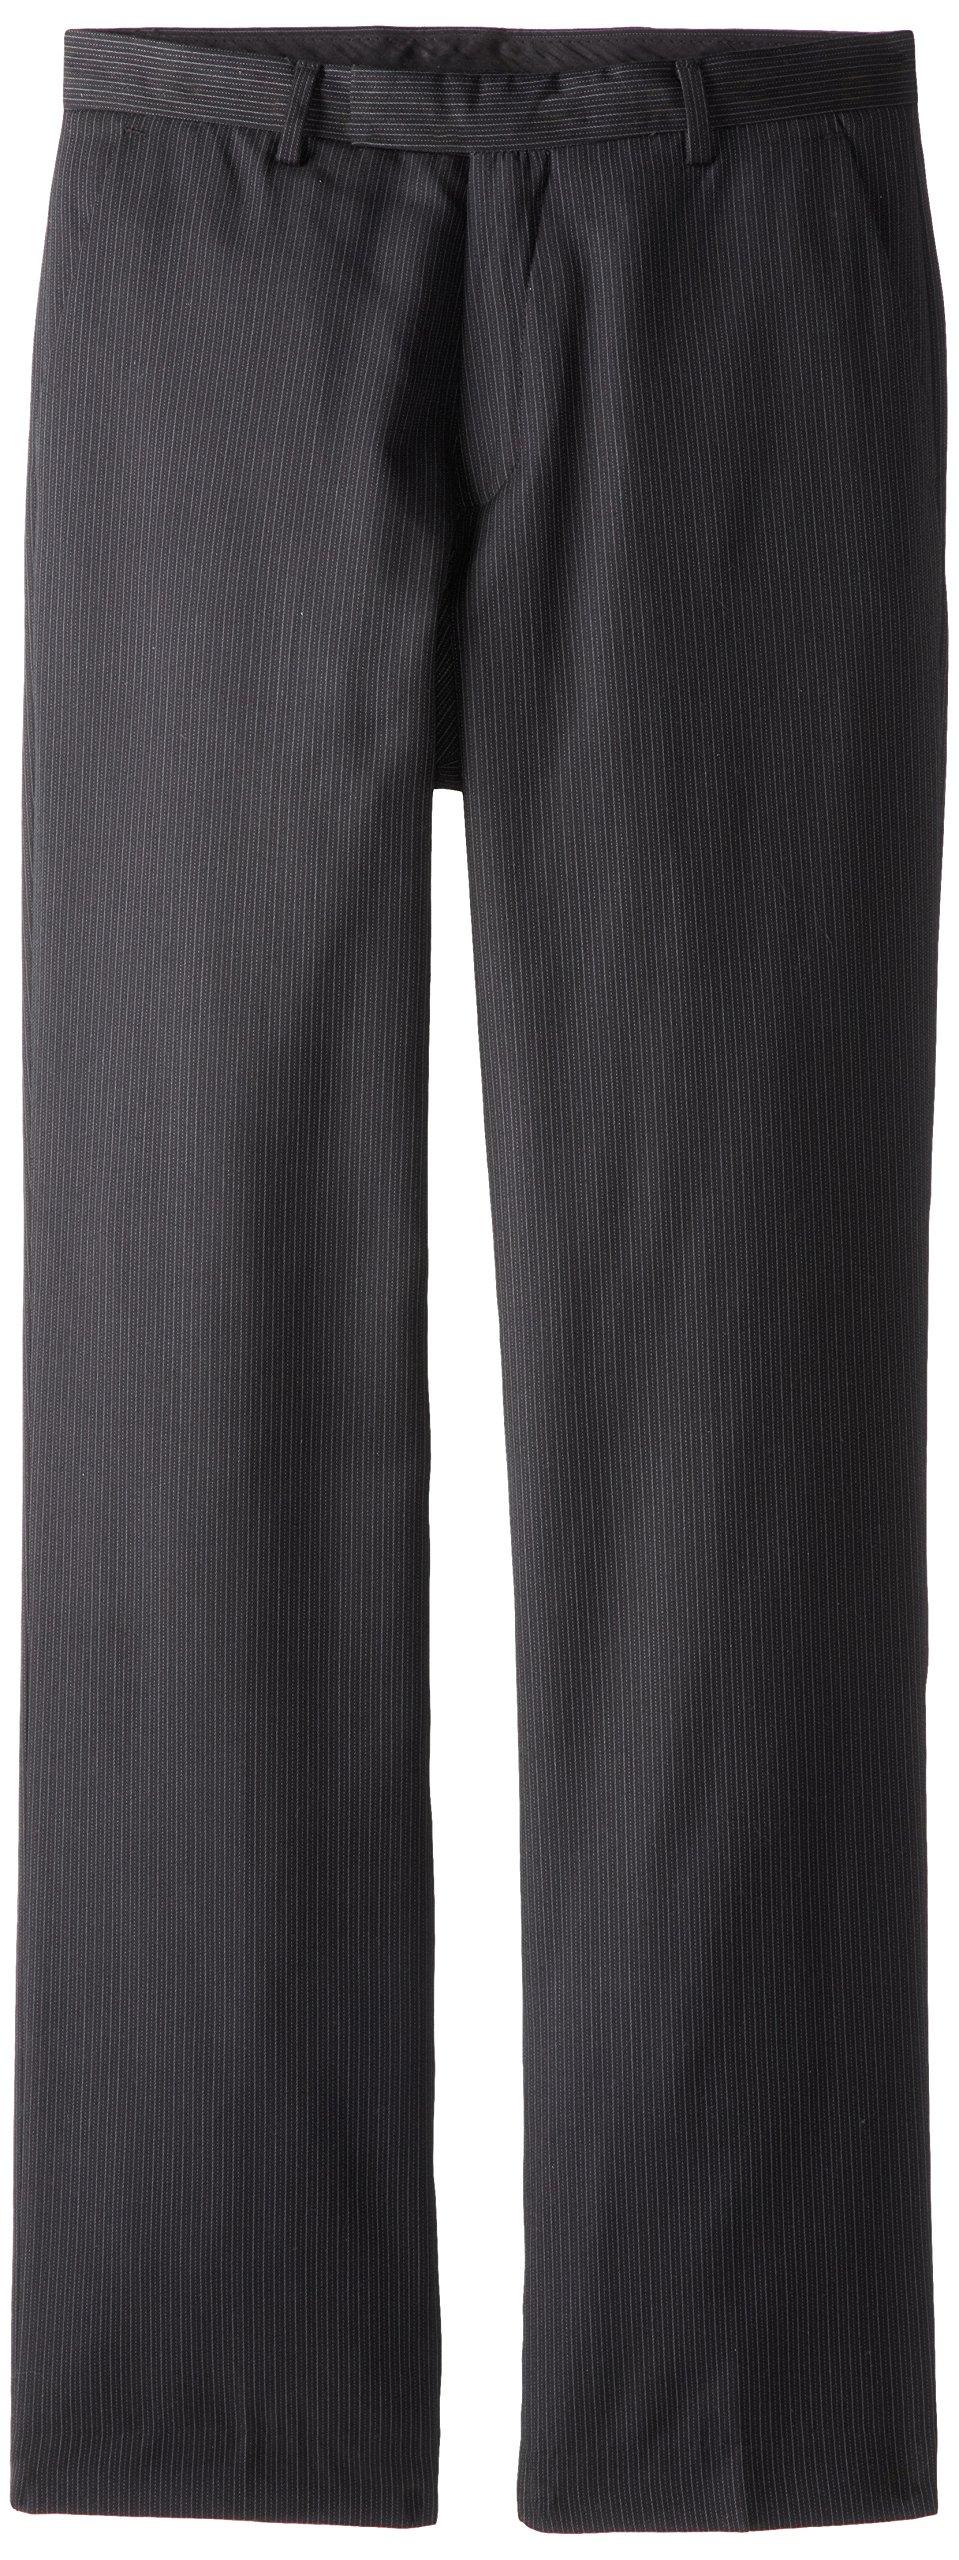 Calvin Klein Boys' Flat Front Dress Pant, Black, 18